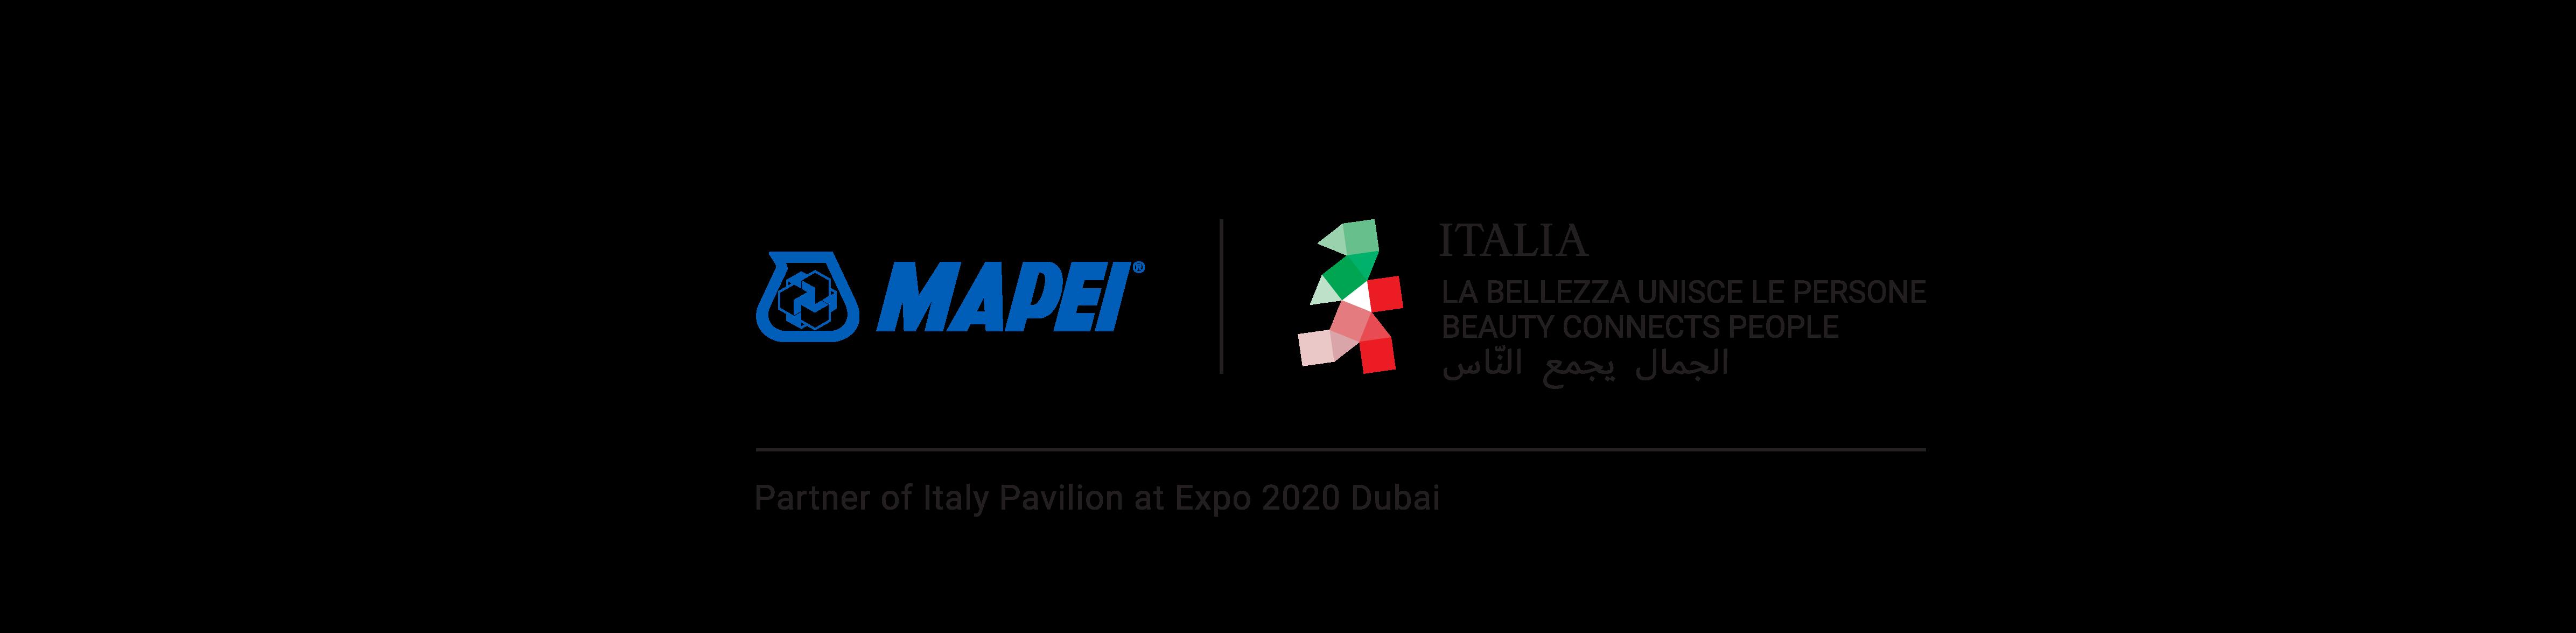 Mapei Partner of Italy Pavilion